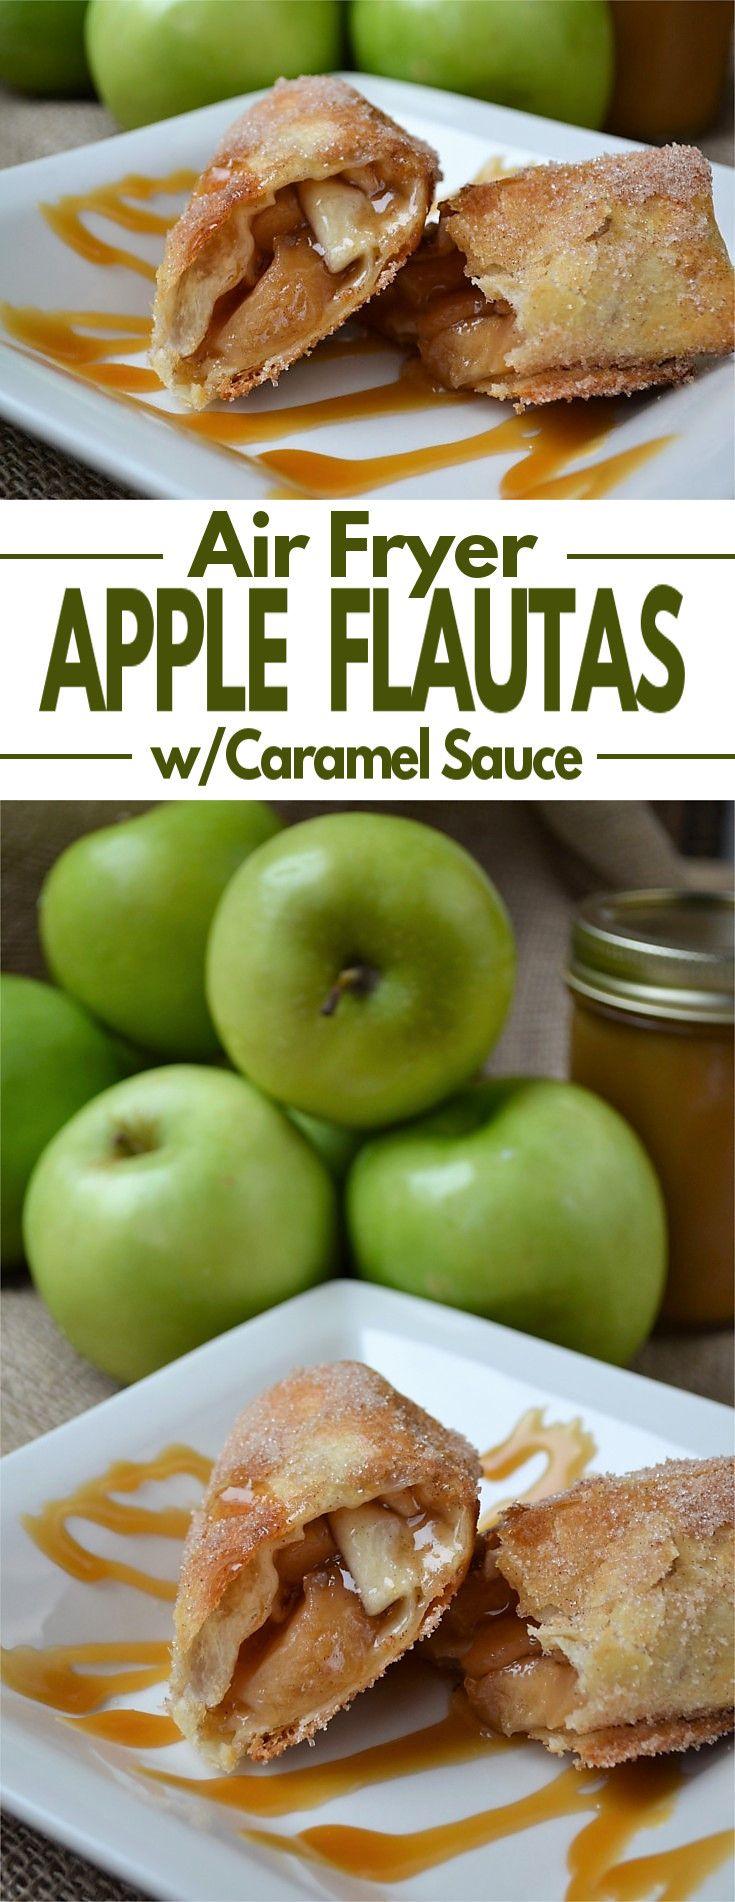 Simple Apple Pie Flautas Recipe Tender apple slices and